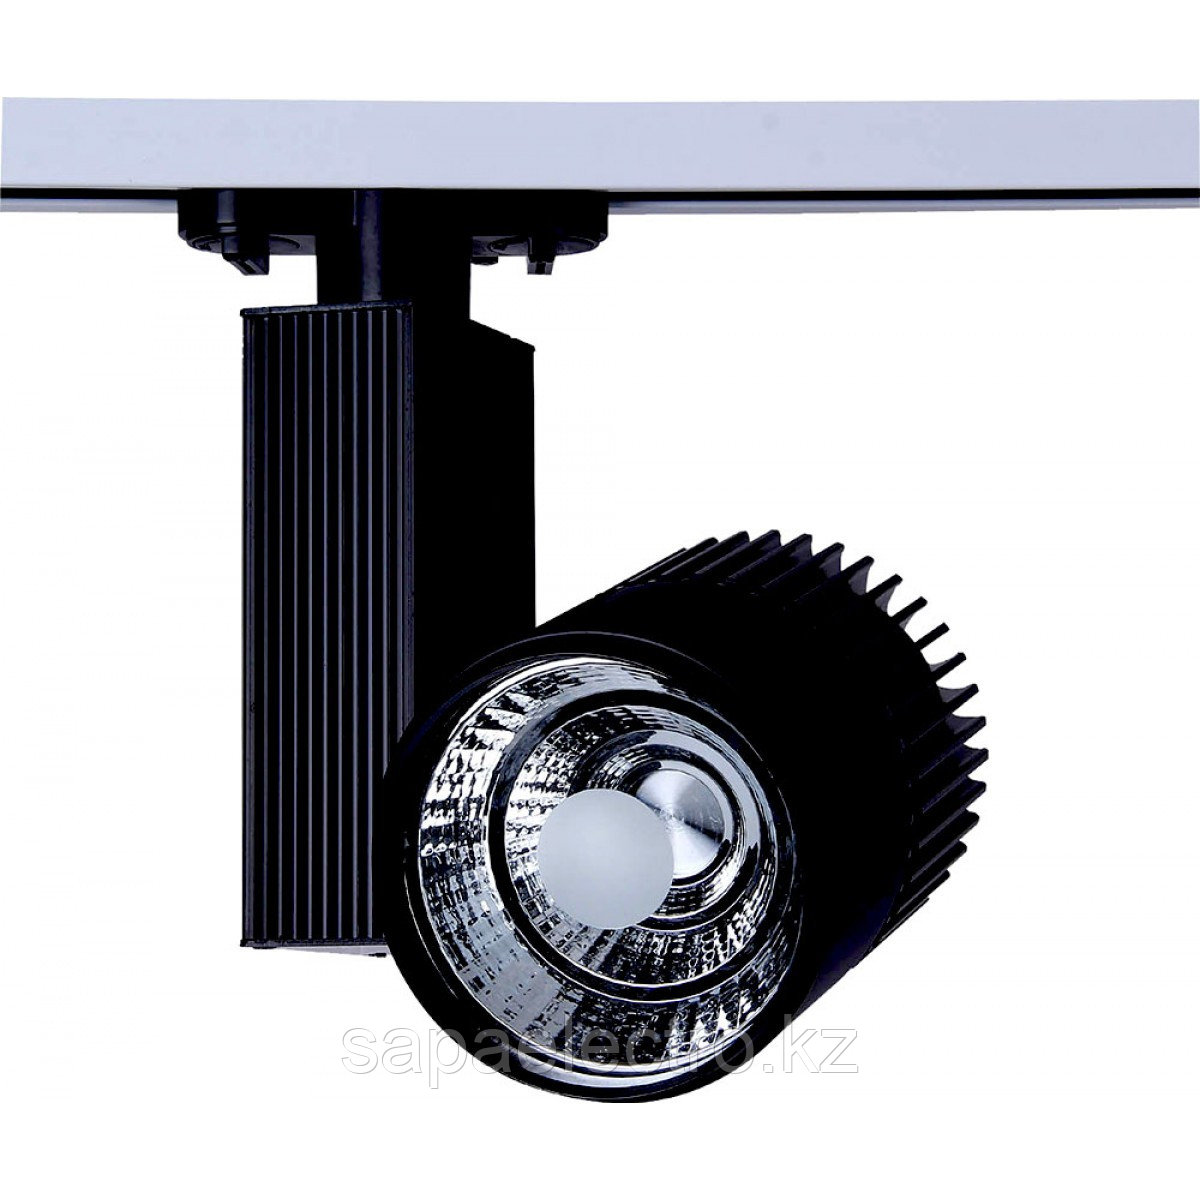 Св-к. LED HZG-H096 30W 5700K BLACK TRACK (TS)20шт